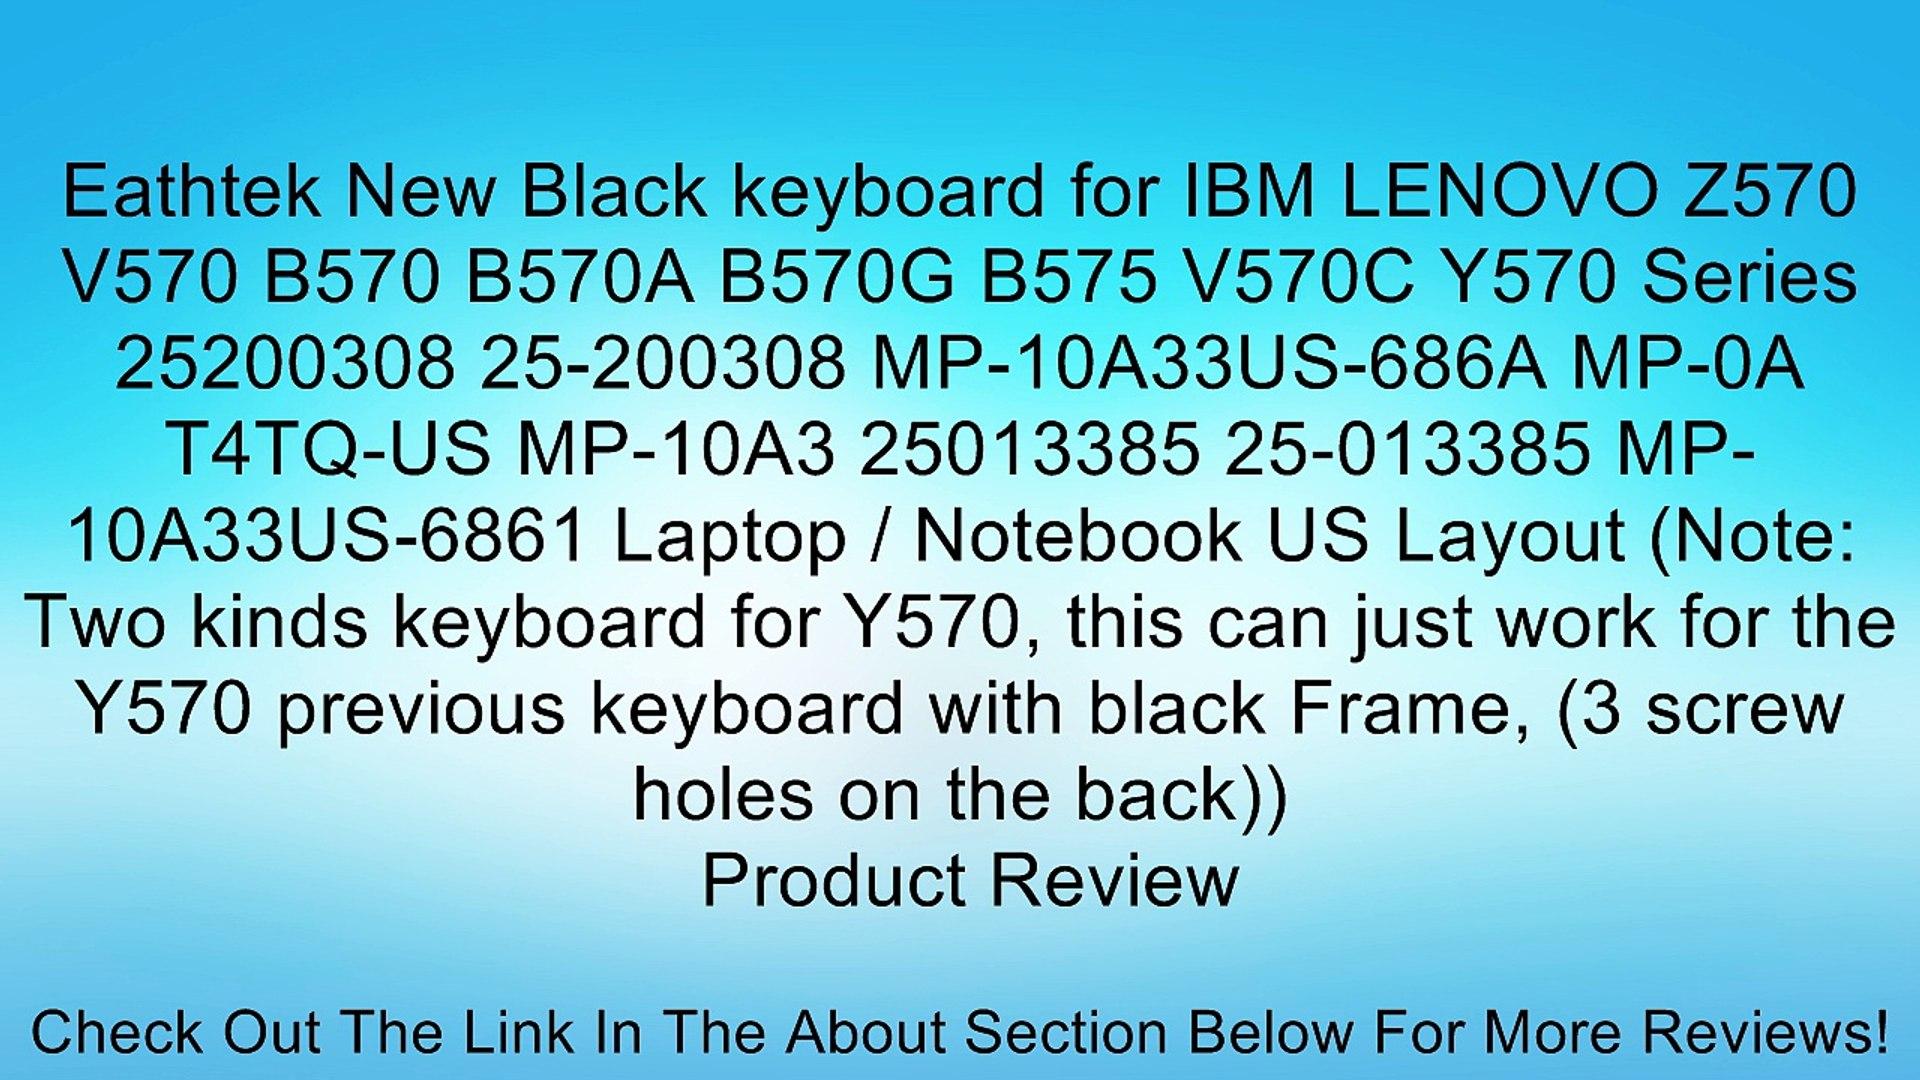 Eathtek New Black keyboard for IBM LENOVO Z570 V570 B570 B570A B570G B575  V570C Y570 Series 25200308 25-200308 MP-10A33US-686A MP-0A T4TQ-US MP-10A3  25013385 25-013385 MP-10A33US-6861 Laptop /